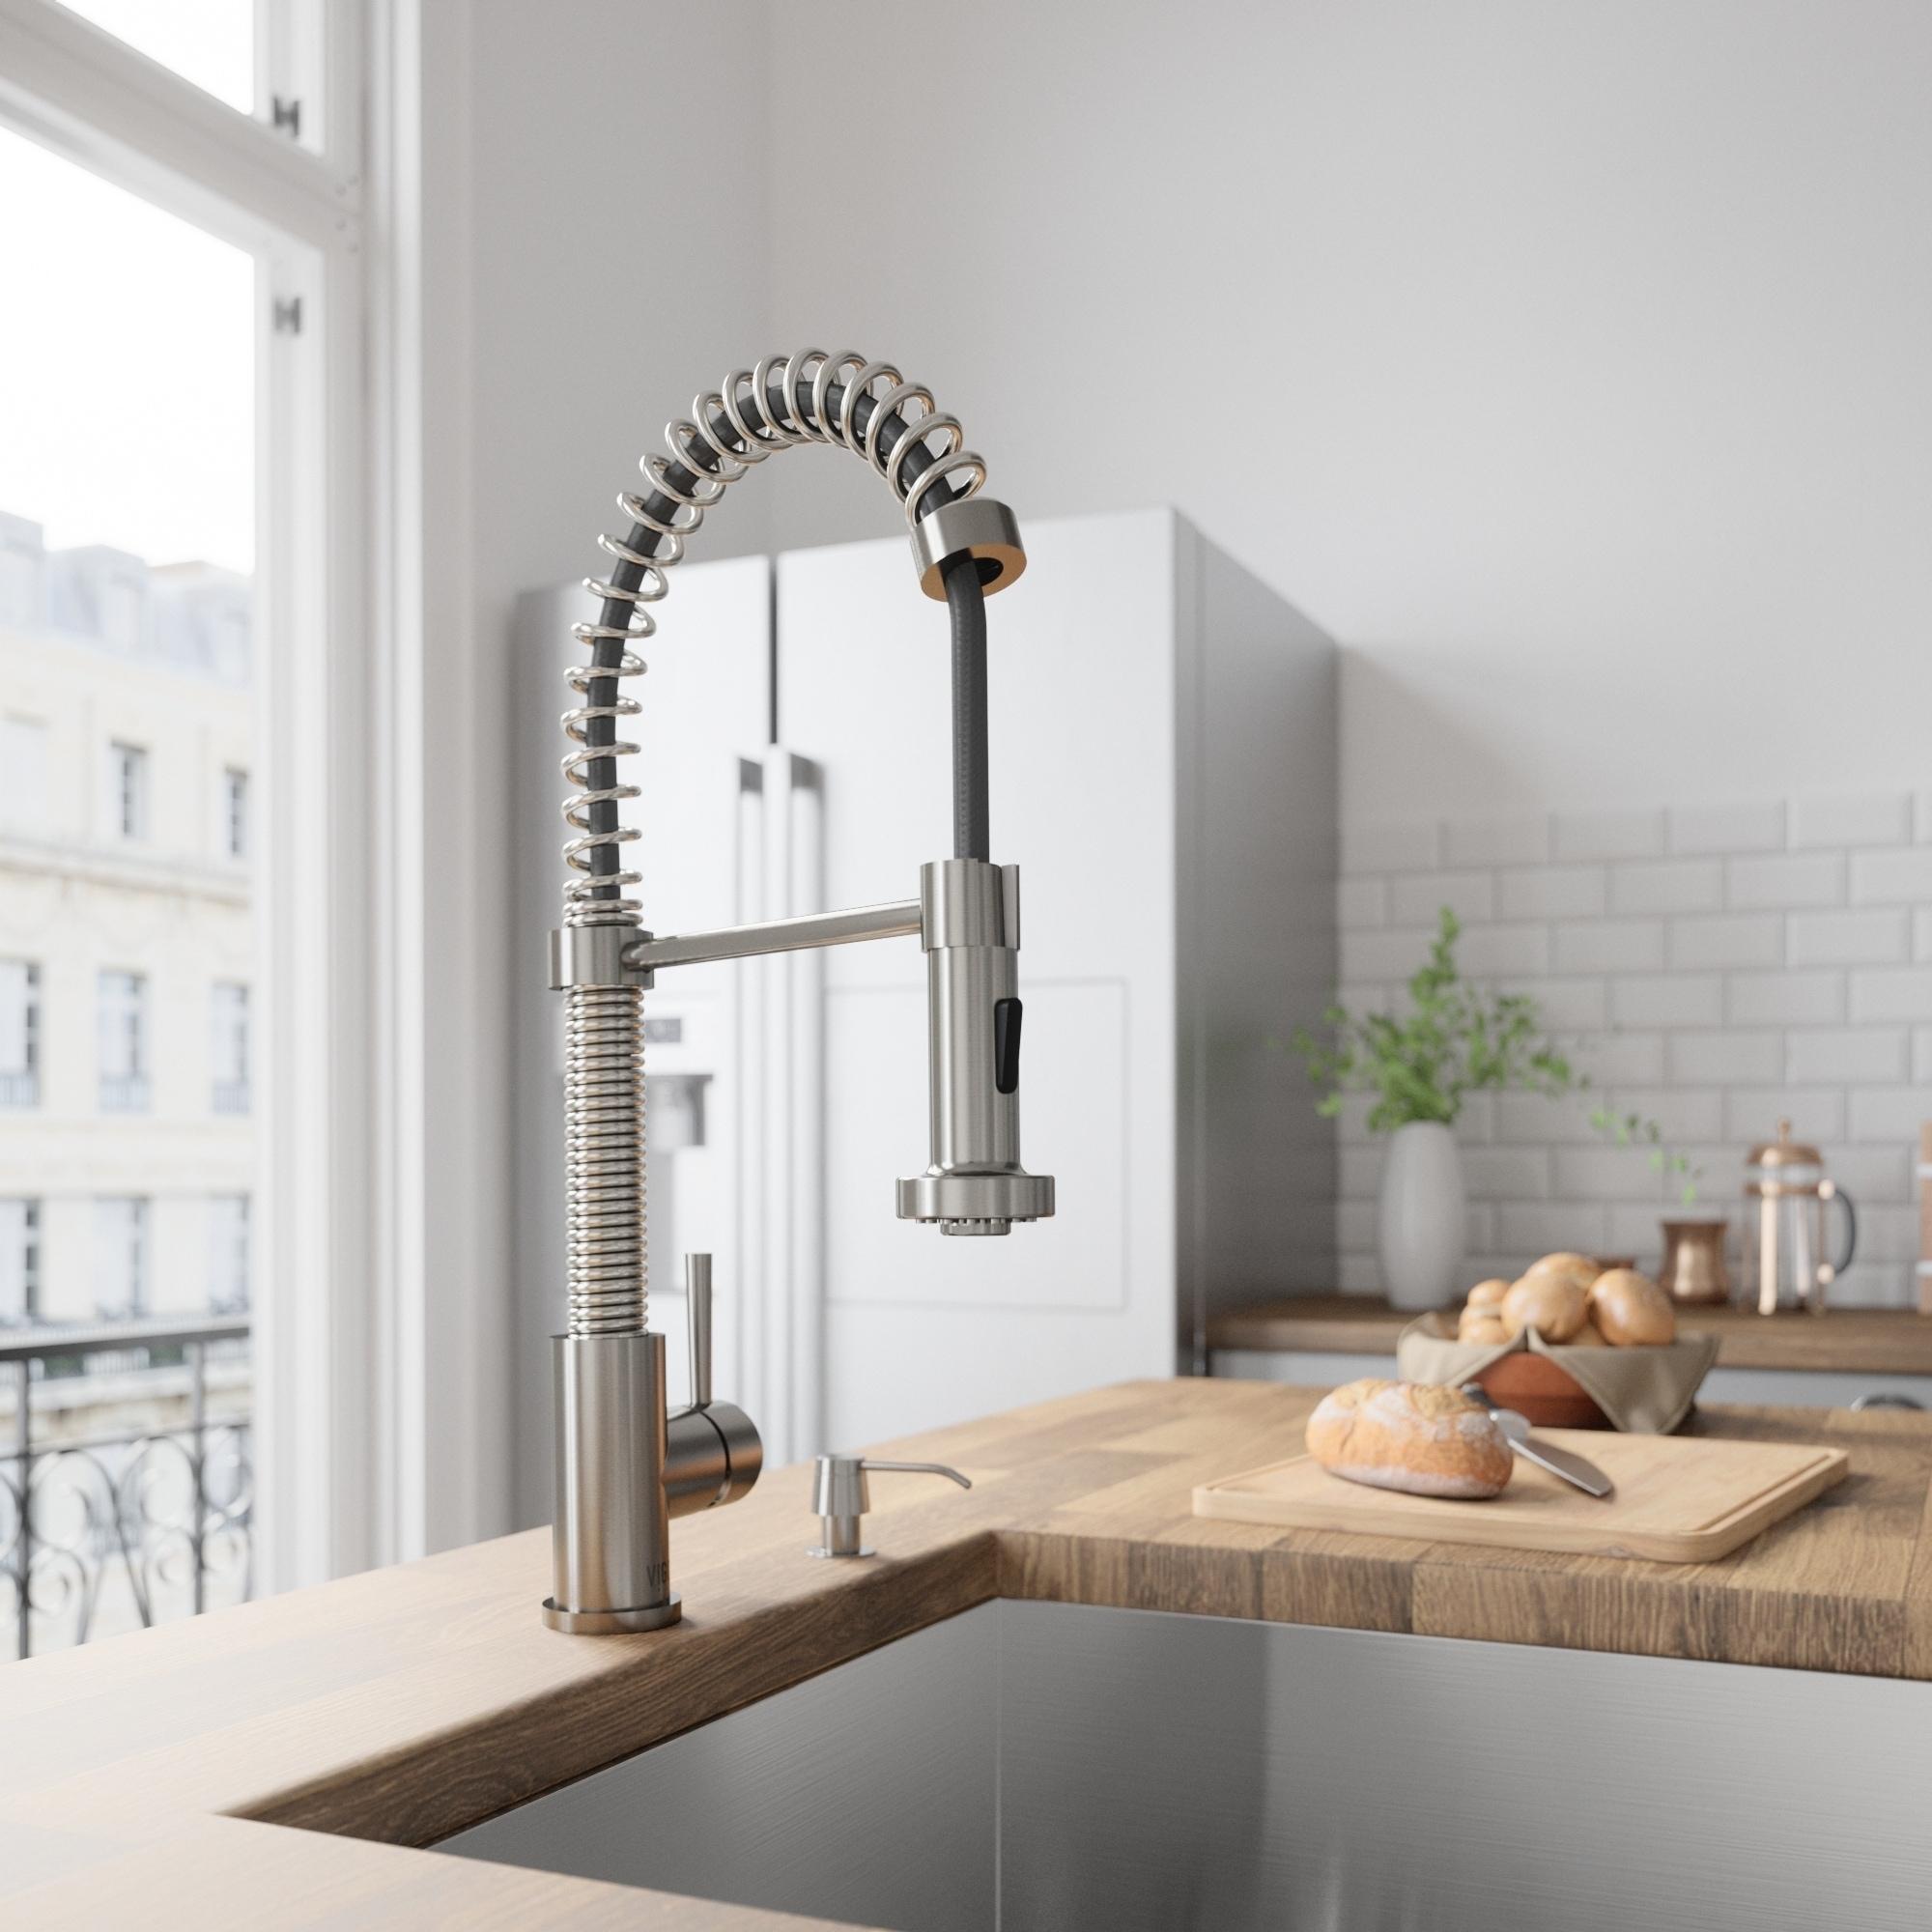 VIGO Edison Stainless Steel Pull-Down Spray Kitchen Faucet